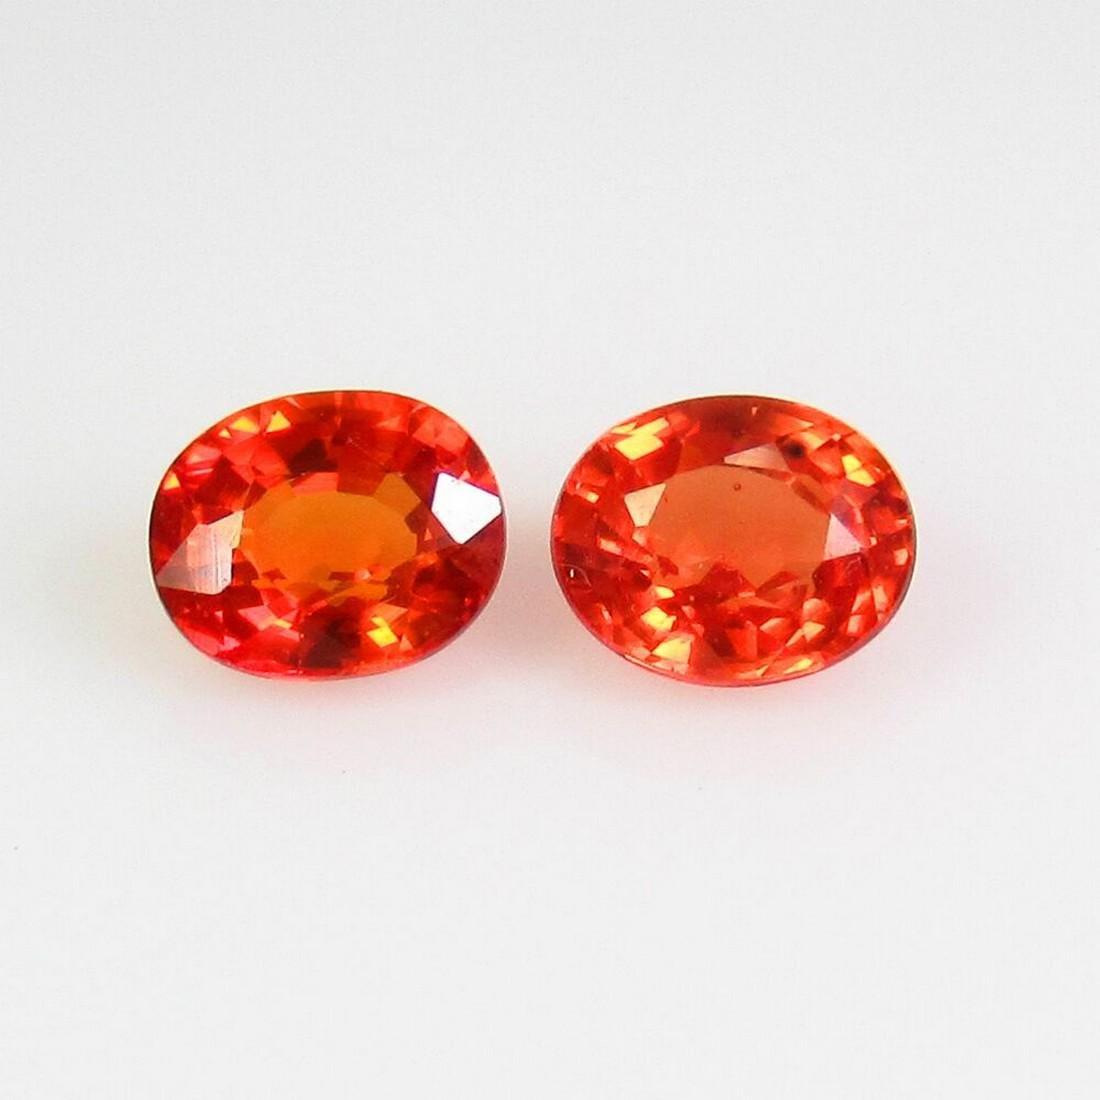 1.10 Ct Natural Ceylon Orange Sapphire Oval Pair